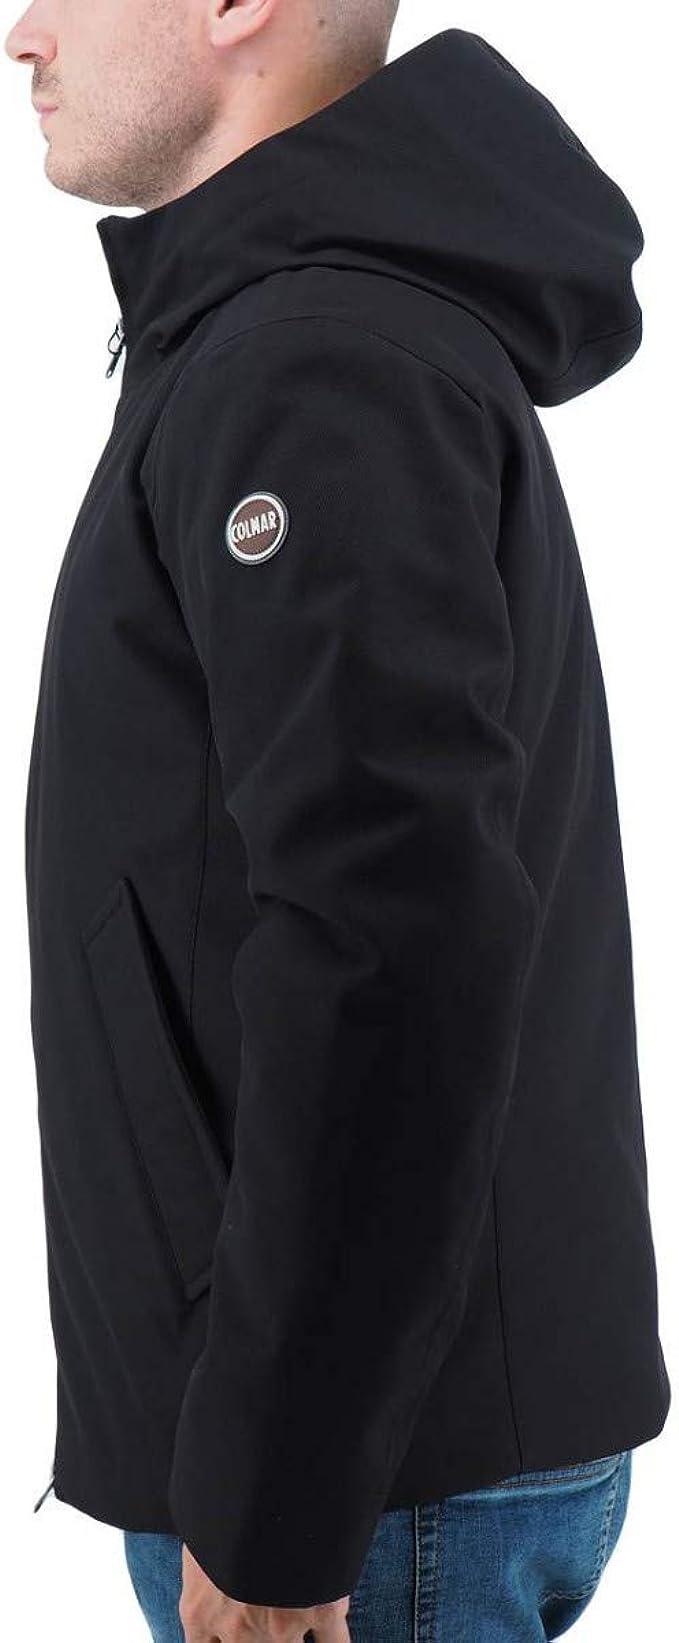 COLMAR ORIGINALS 1287-1RT-99 Riddle Down Jacket Piumino Uomo NERO